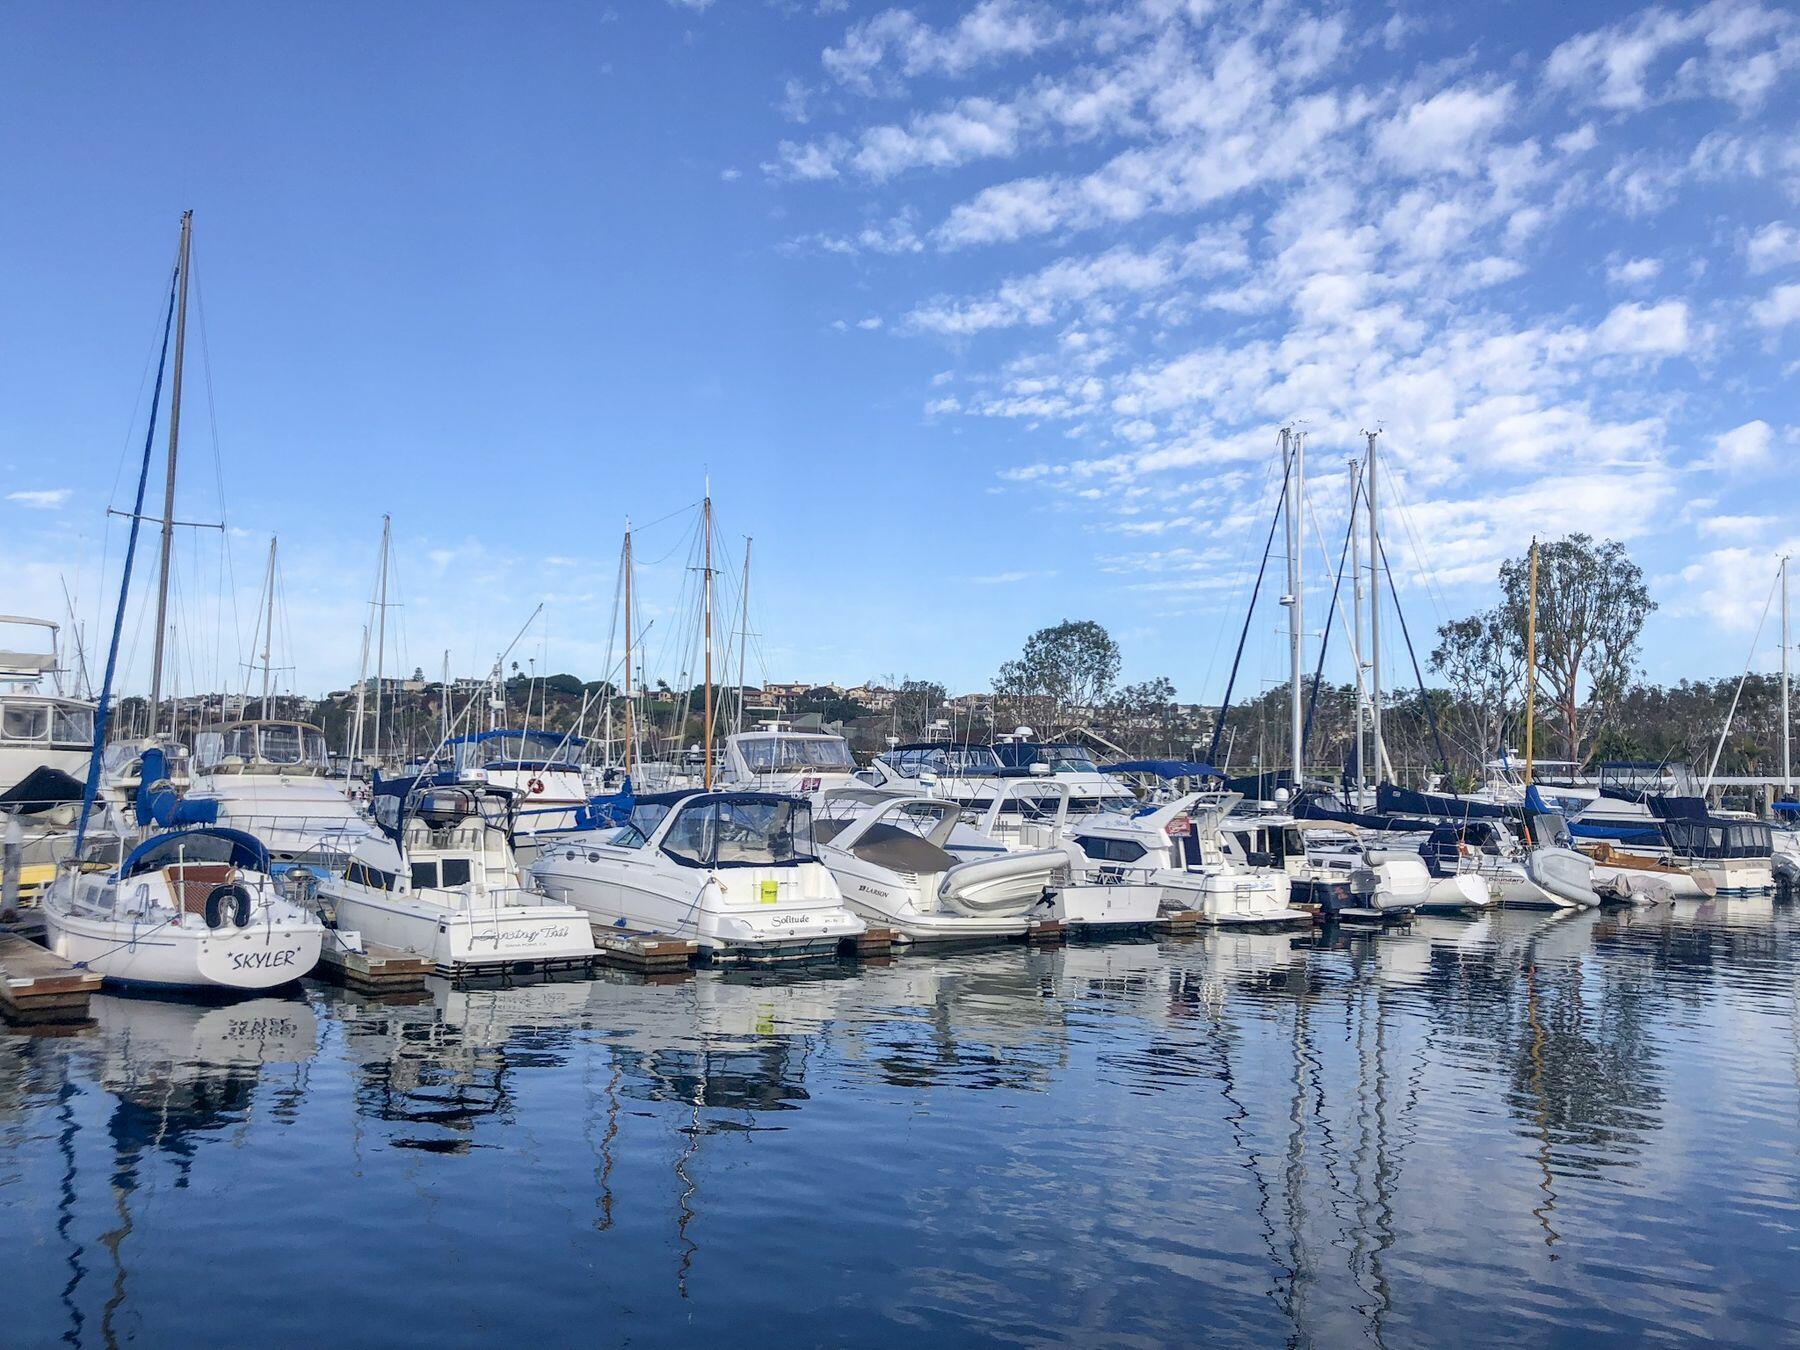 Marina boat view